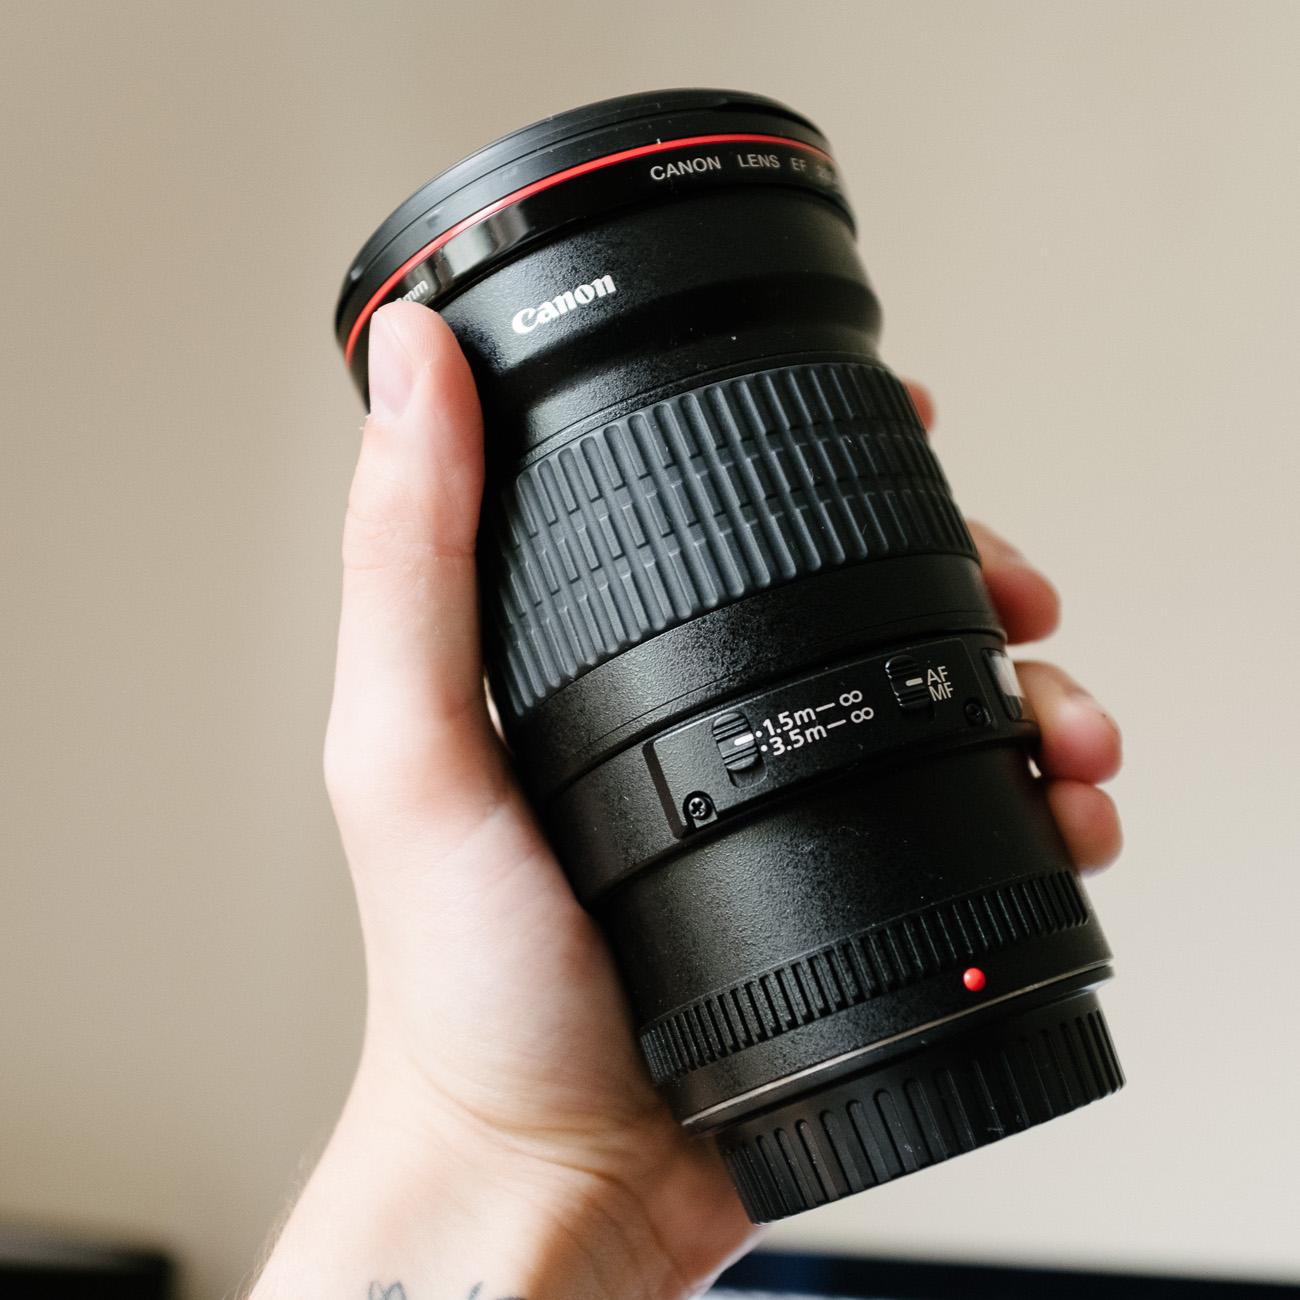 canon-200-2.8-lens-review-full-frame-l-series-product-2.jpg